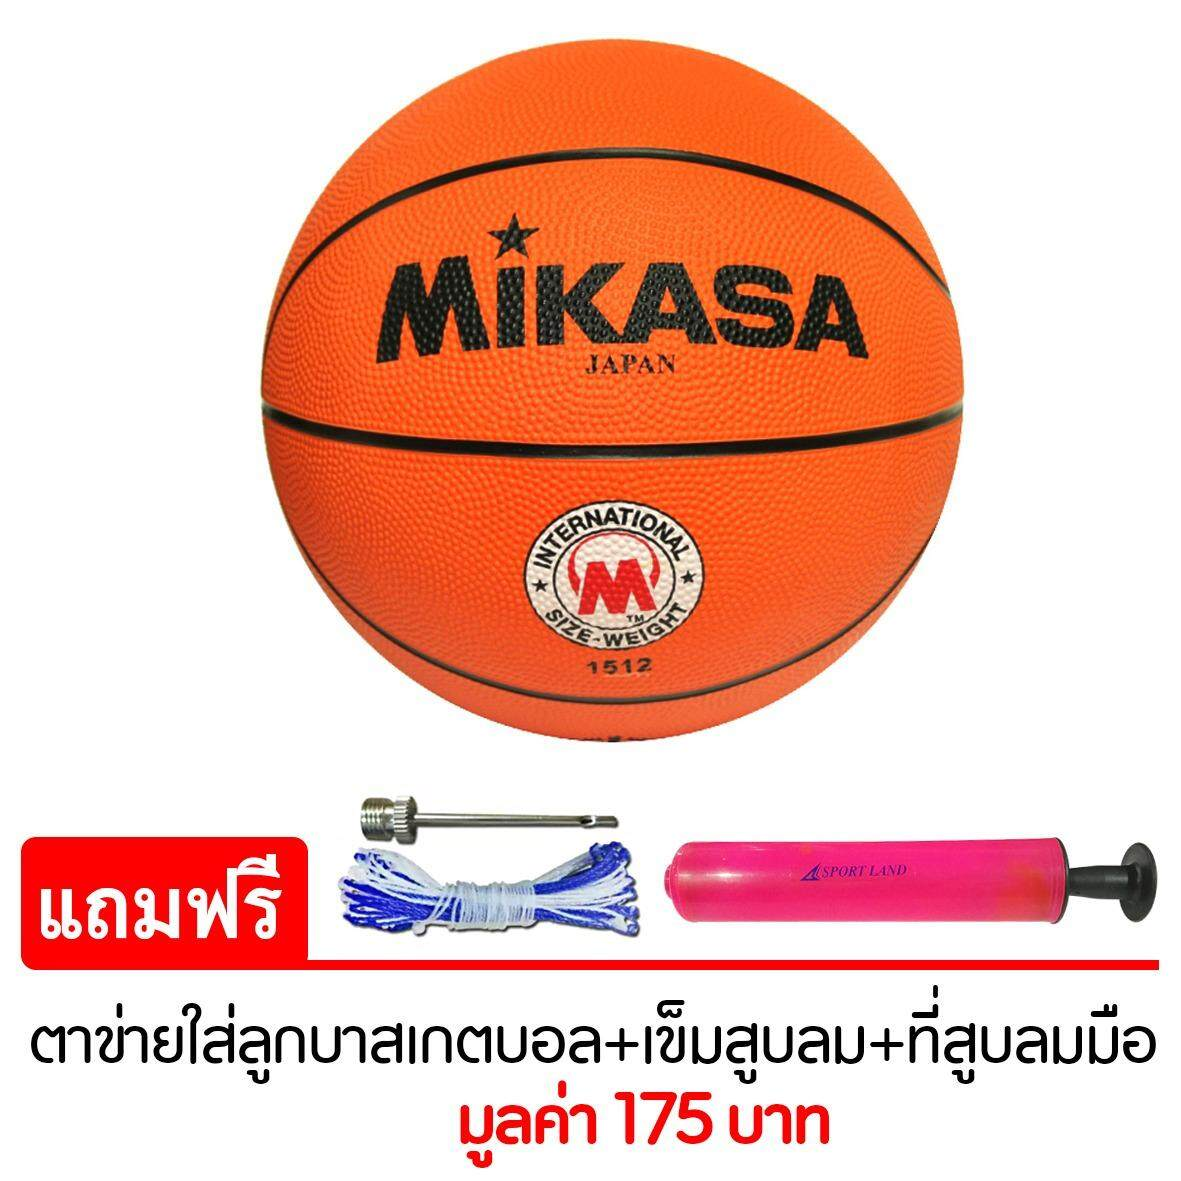 MIKASA บาสเก็ตบอล Basketball MKS RB 1512 แถมฟรี ตาข่ายใส่ลูกบาสเกตบอล + เข็มสูบสูบลม + สูบมือ SPL รุ่น SL6 สีชมพู